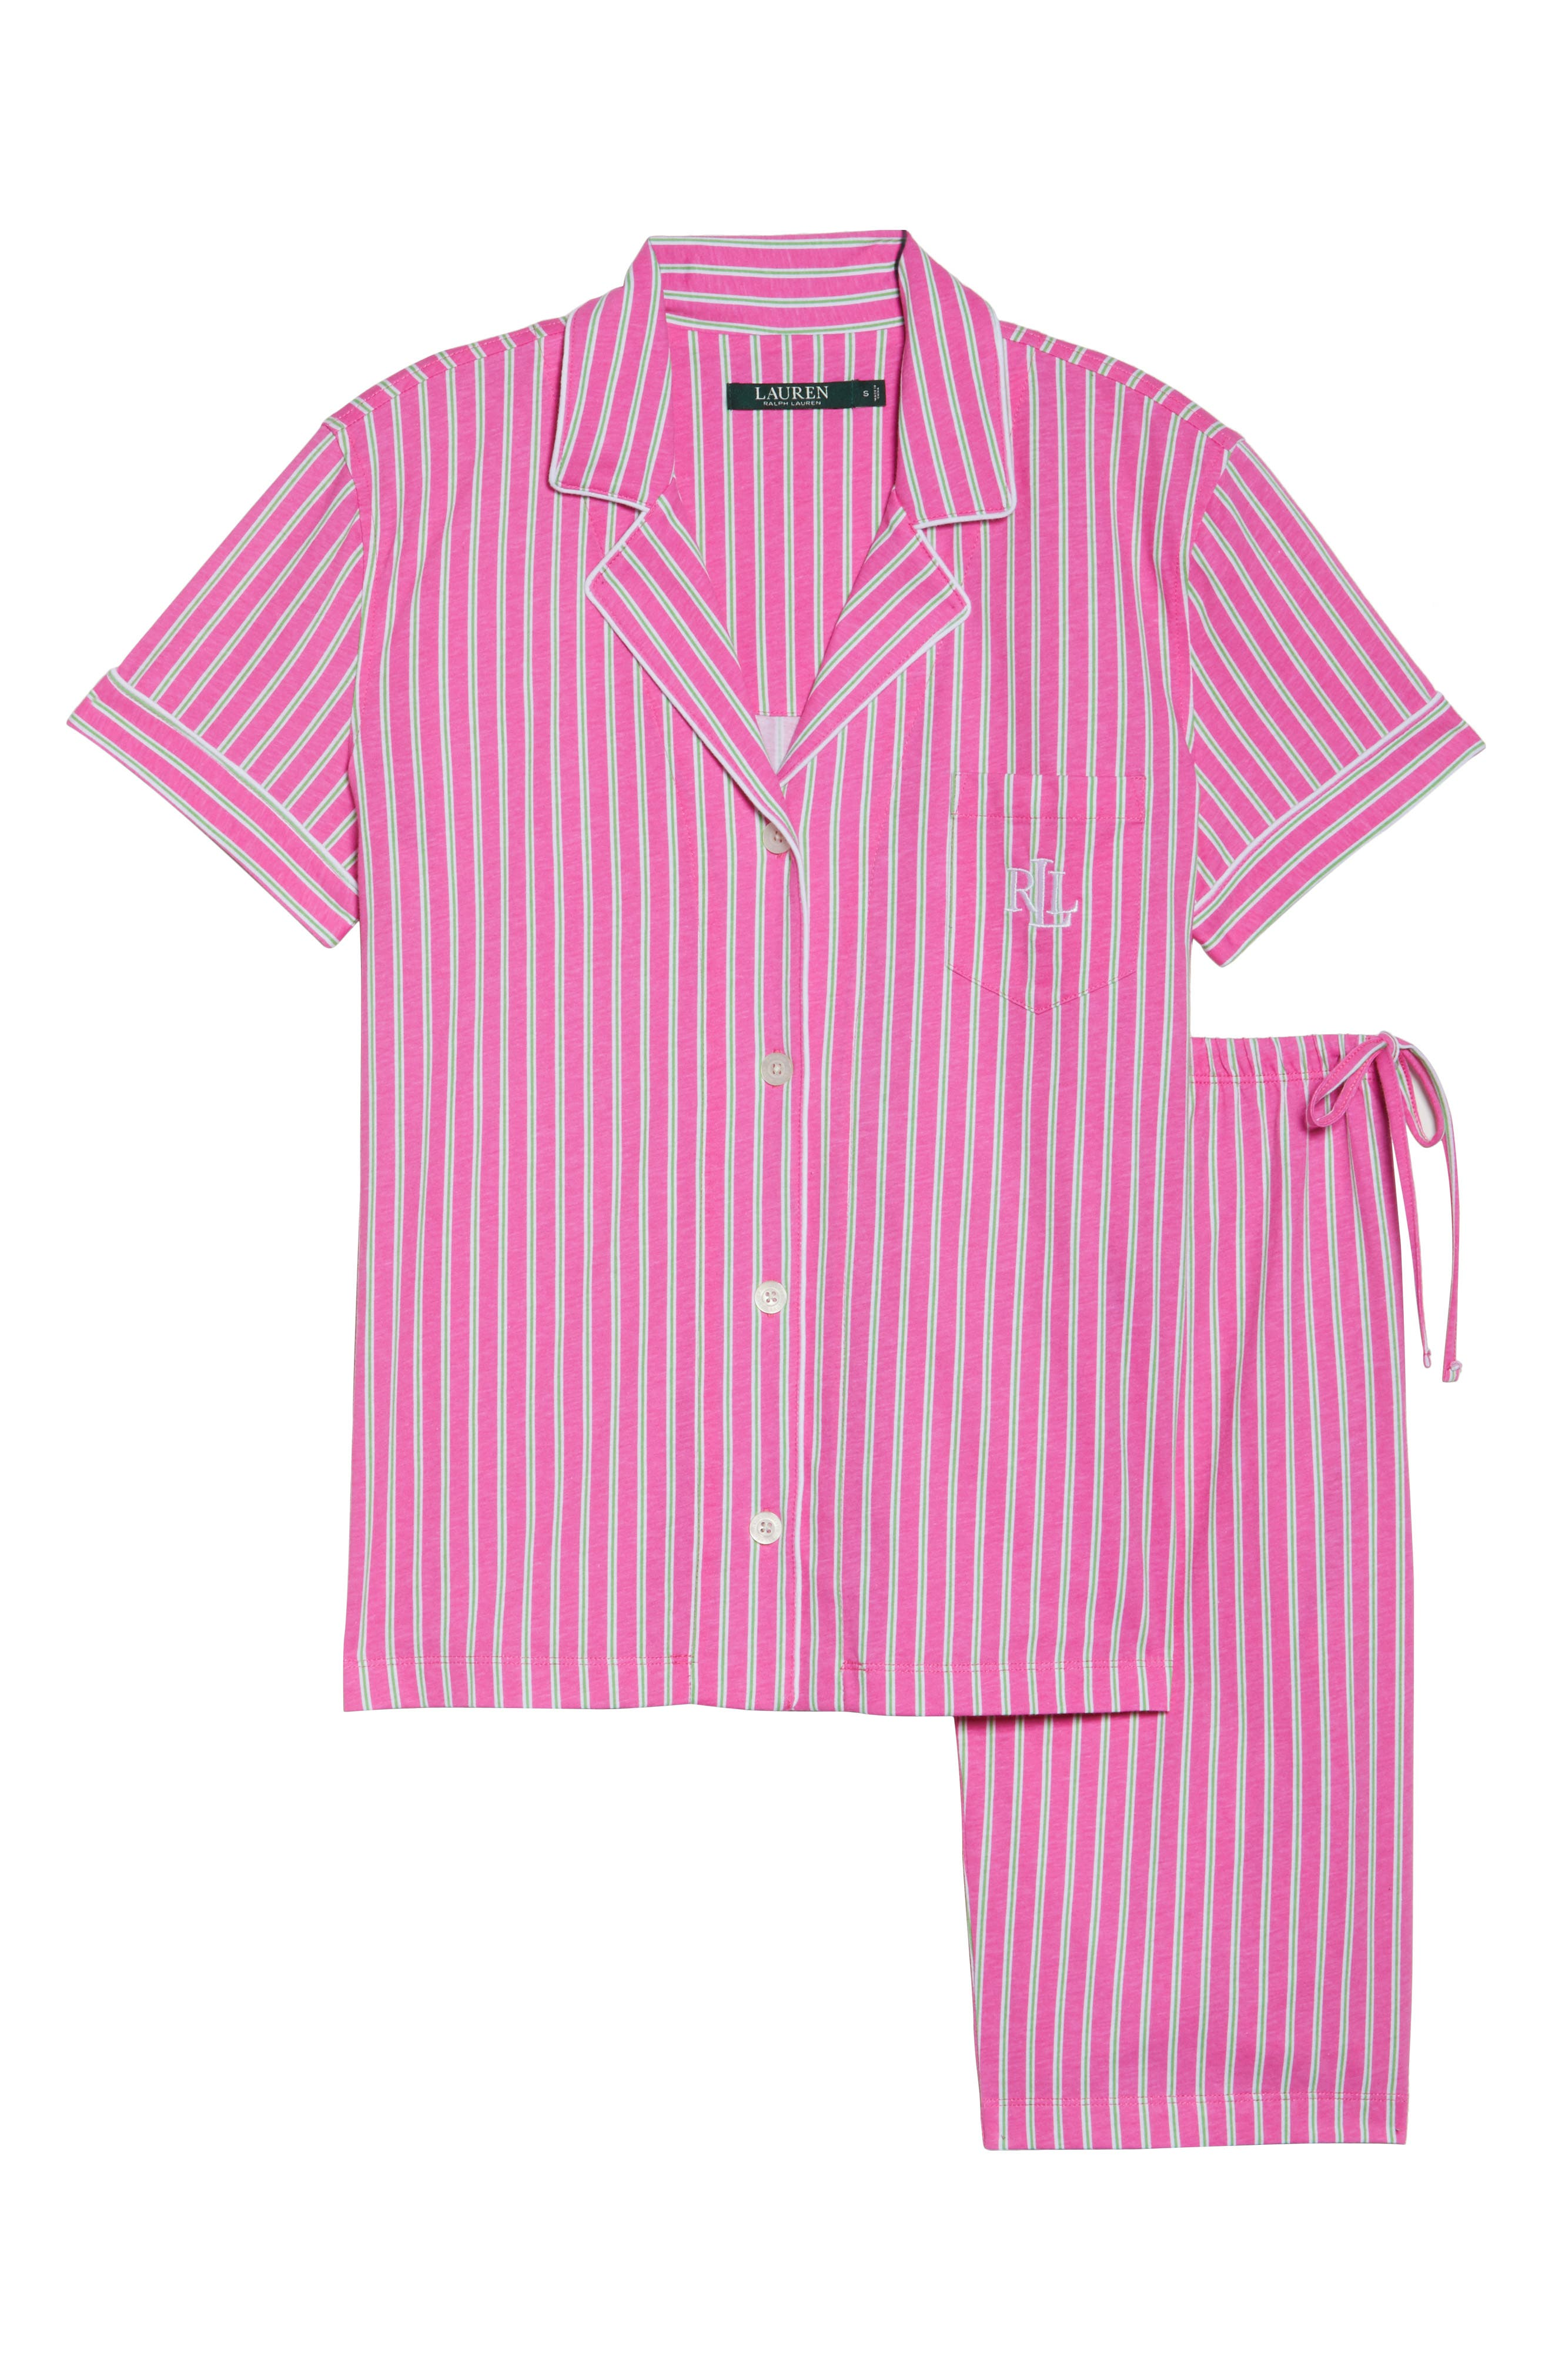 Bermuda Pajamas,                             Alternate thumbnail 4, color,                             Pink Stripe